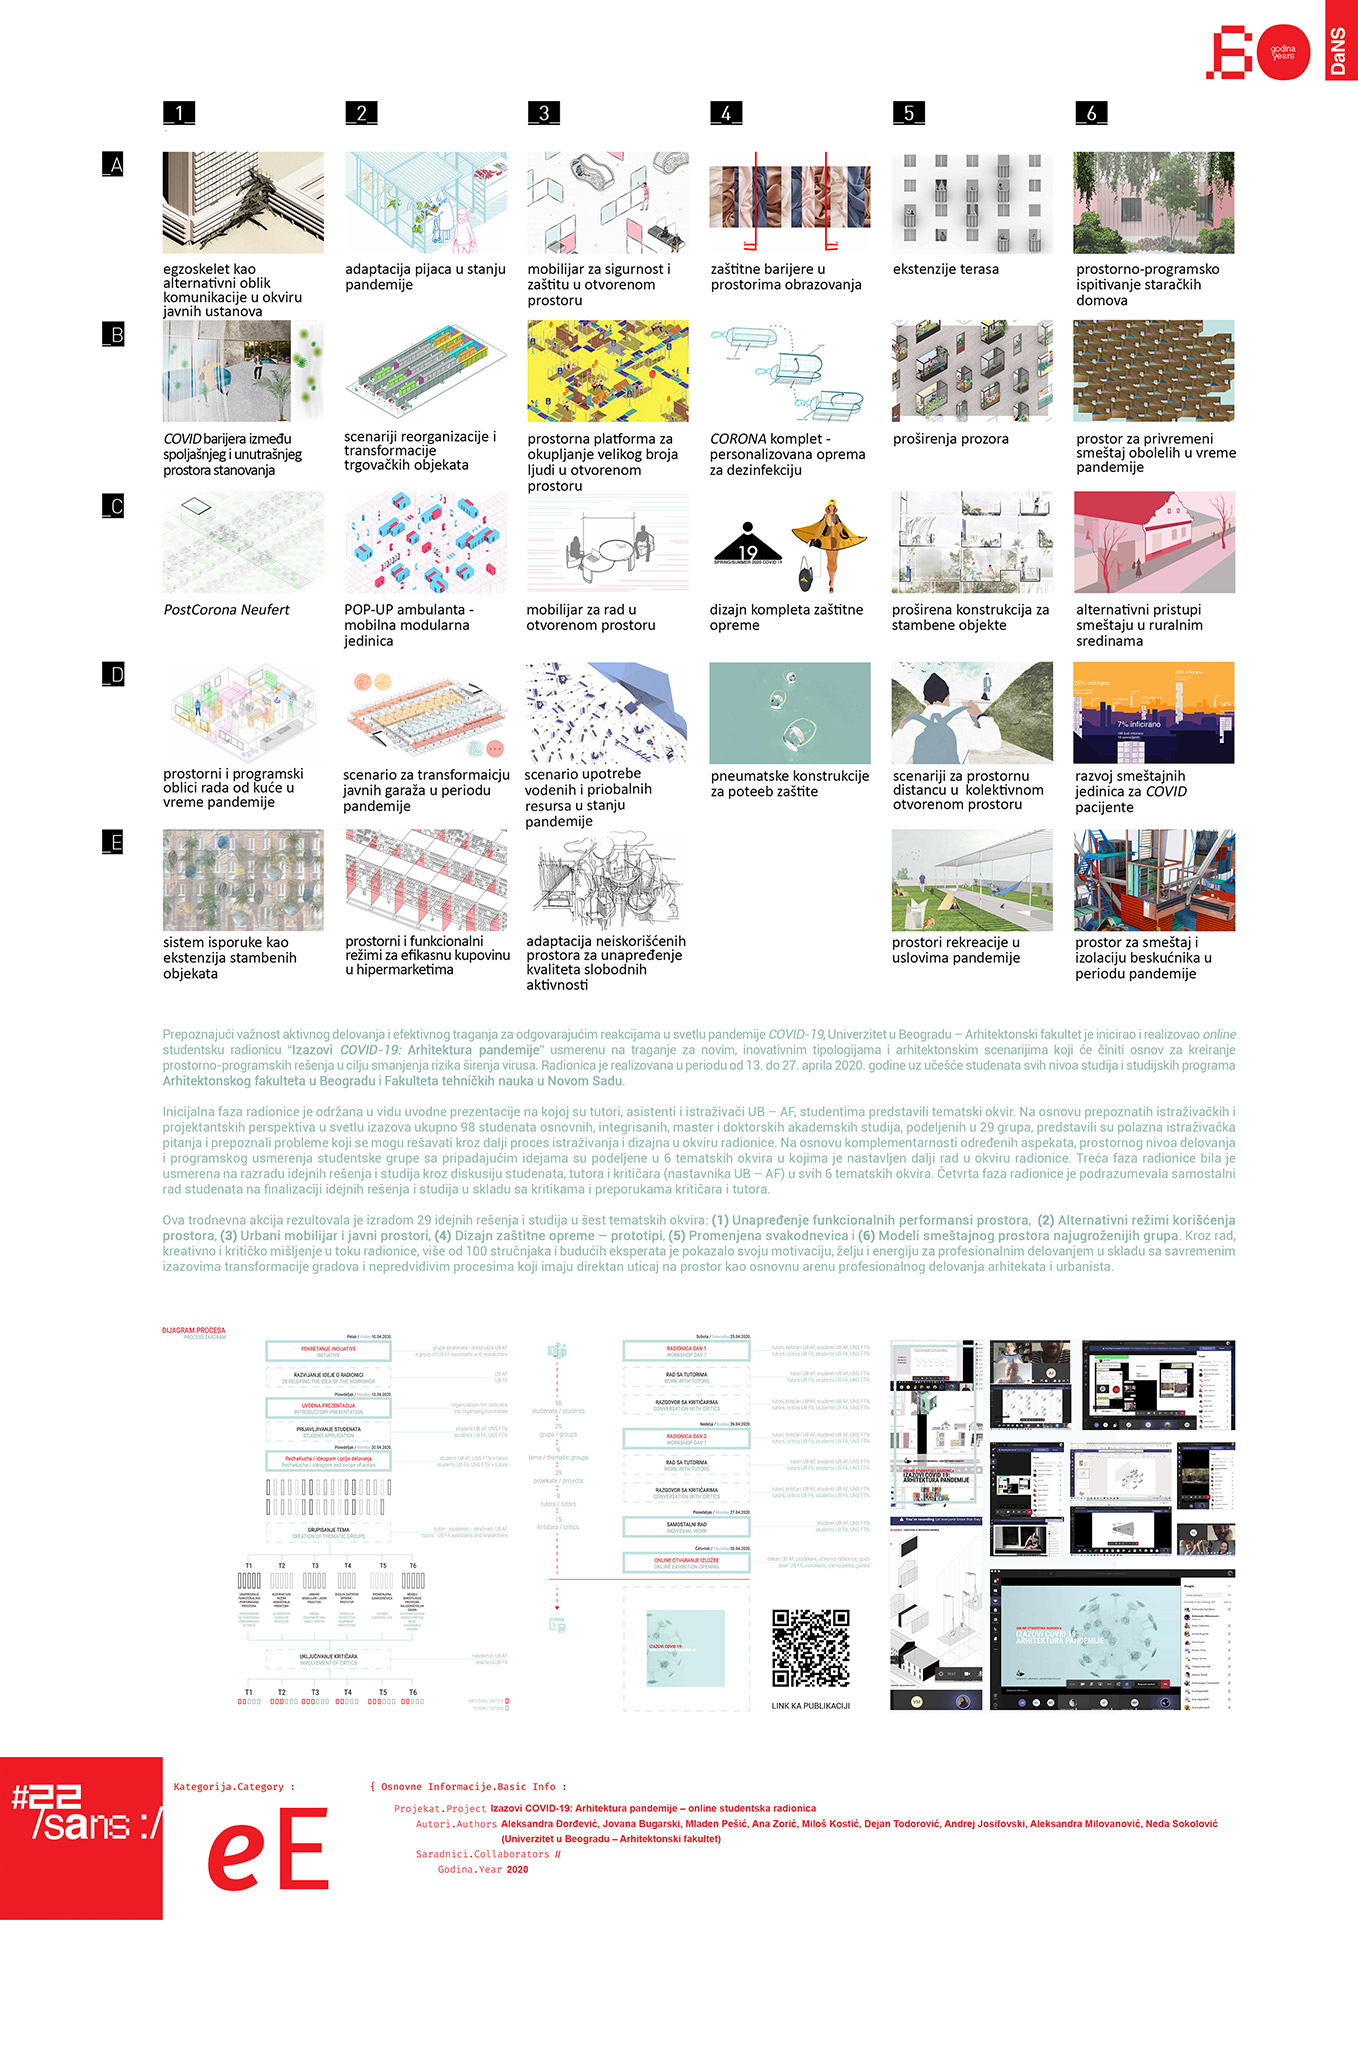 "<p class=""naslov-br"">ee03</p>Izazovi COVID-19: Arhitektura pandemije, online studentska radionica // COVID 19 Challenges: Architecture of Pandemics, an Online Student Workshop"